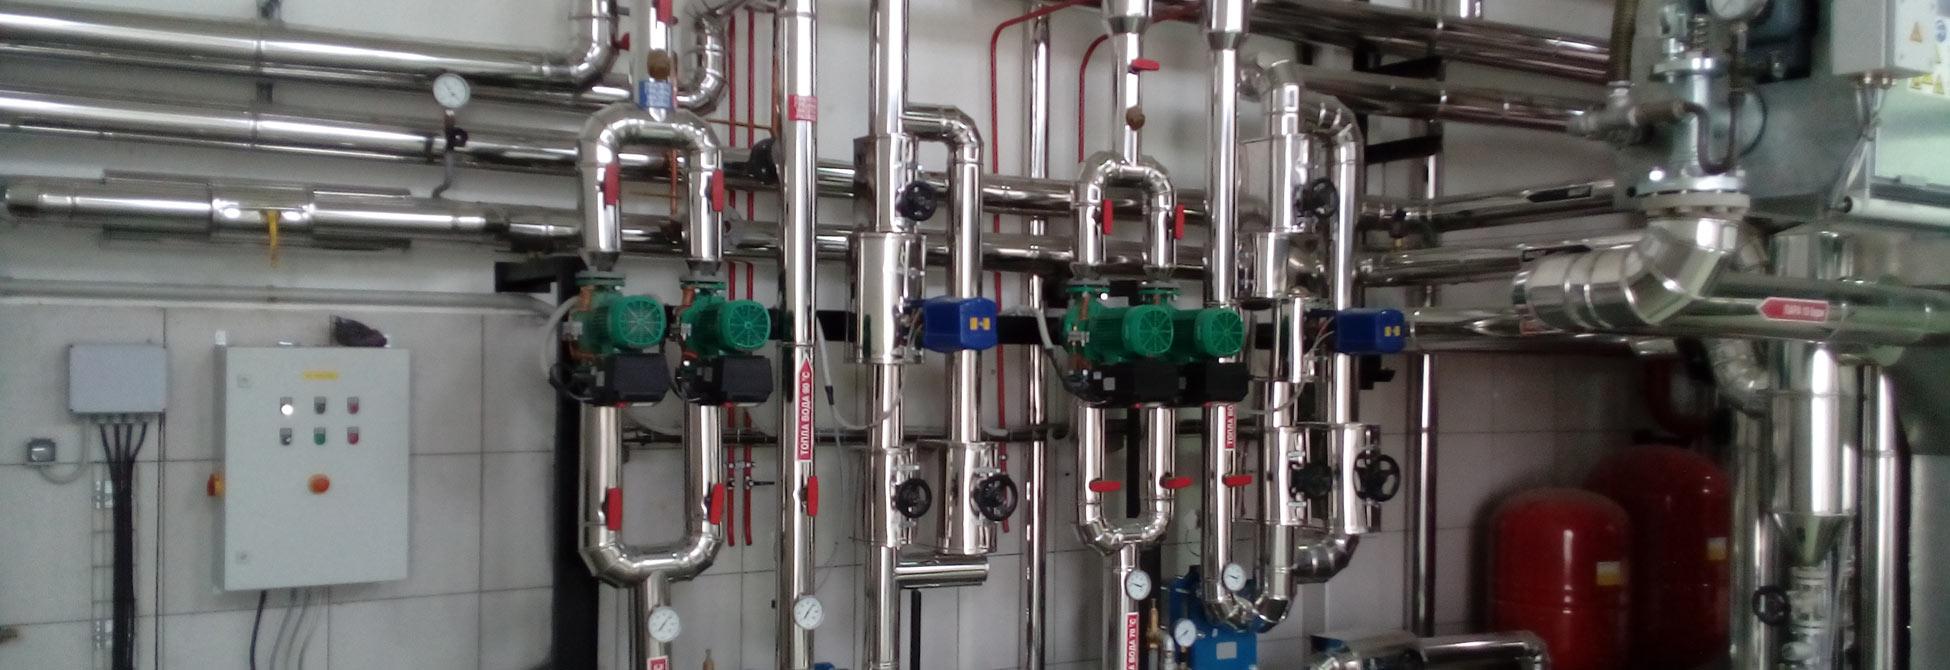 Ventilacione pumpe i kanali